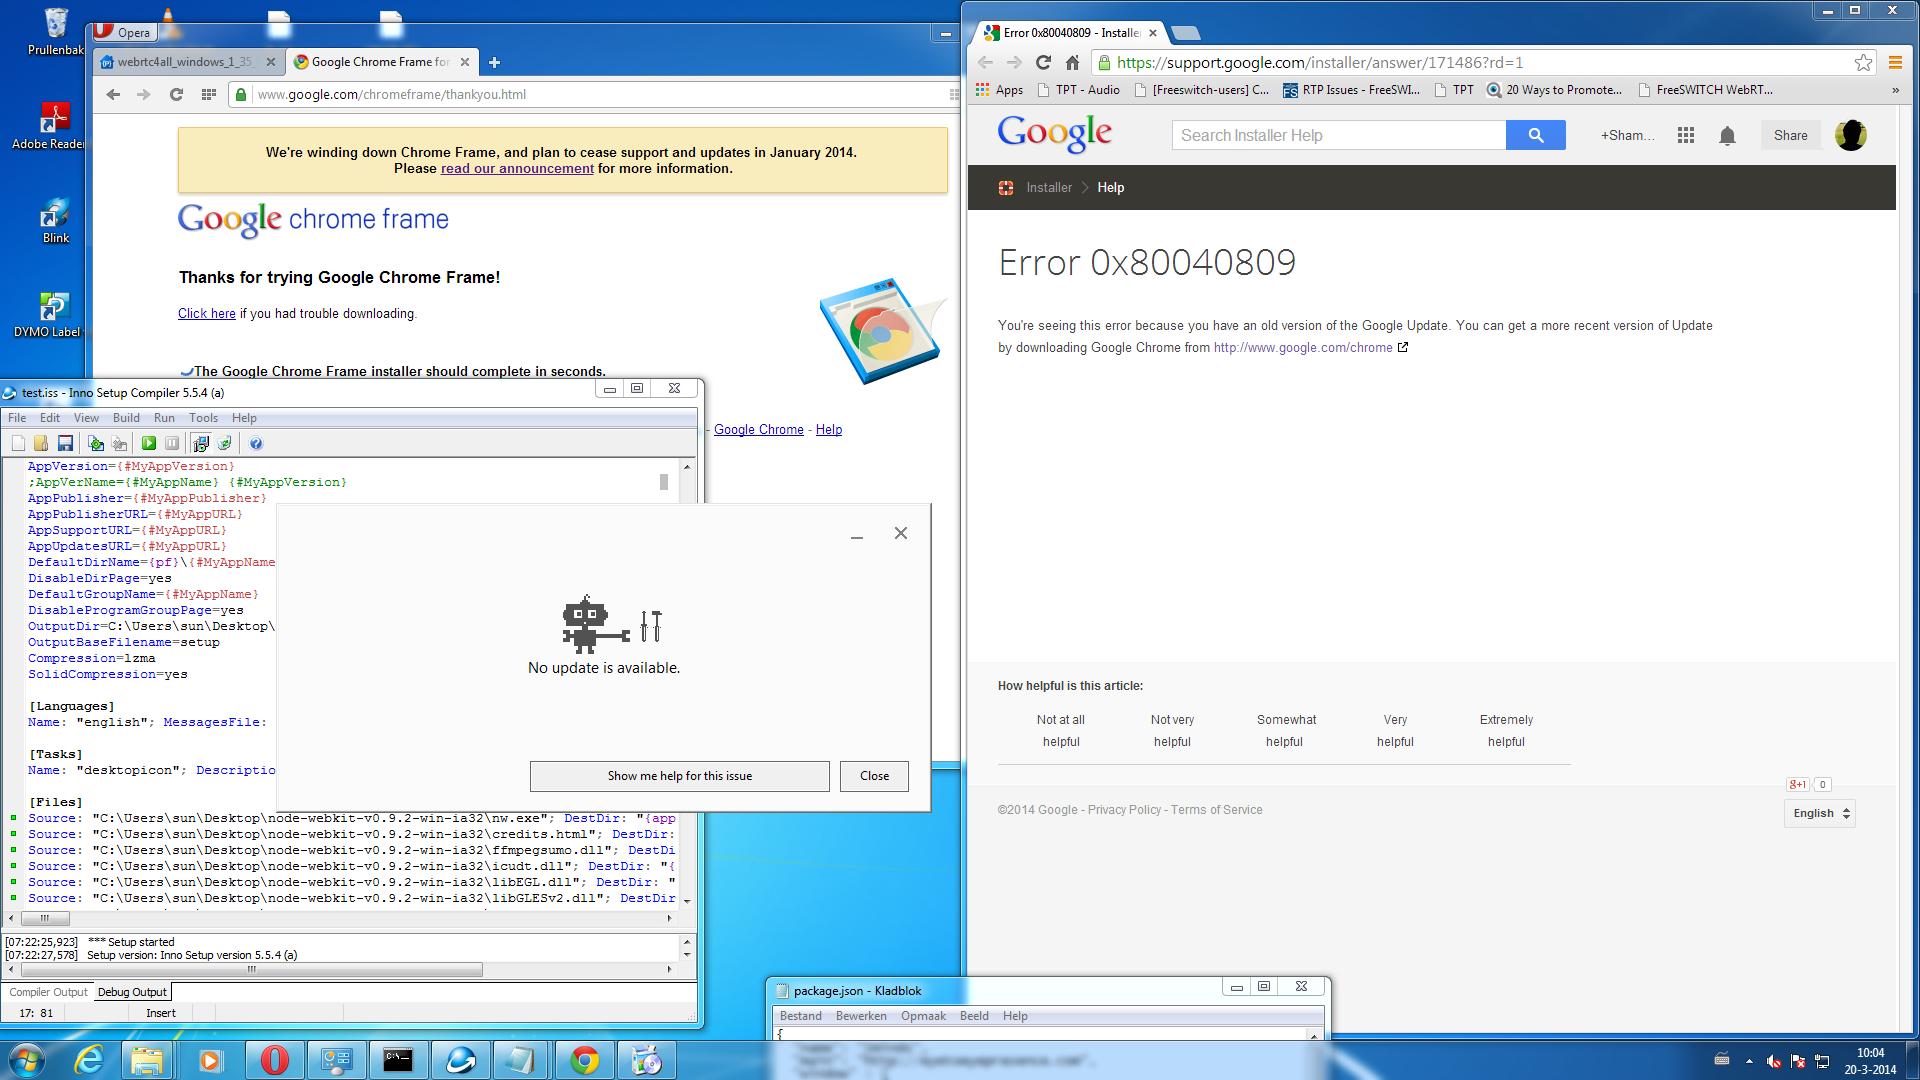 WebRTC - for Internet Explorer and Safari how to do it like Google ...